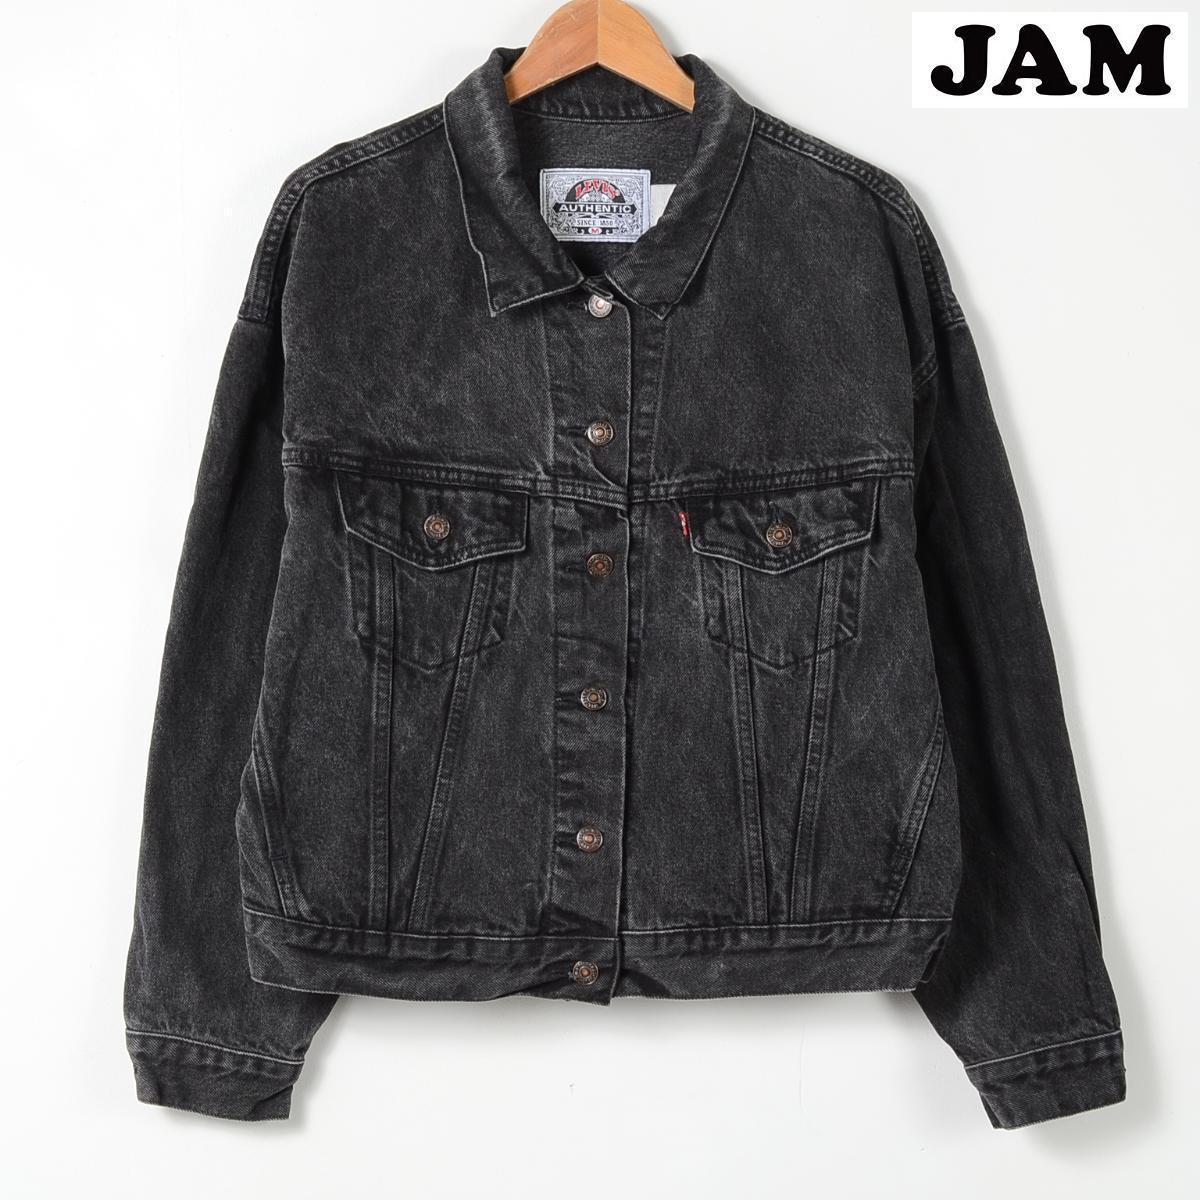 Womens Black Denim Jean Jacket - Jeans Am